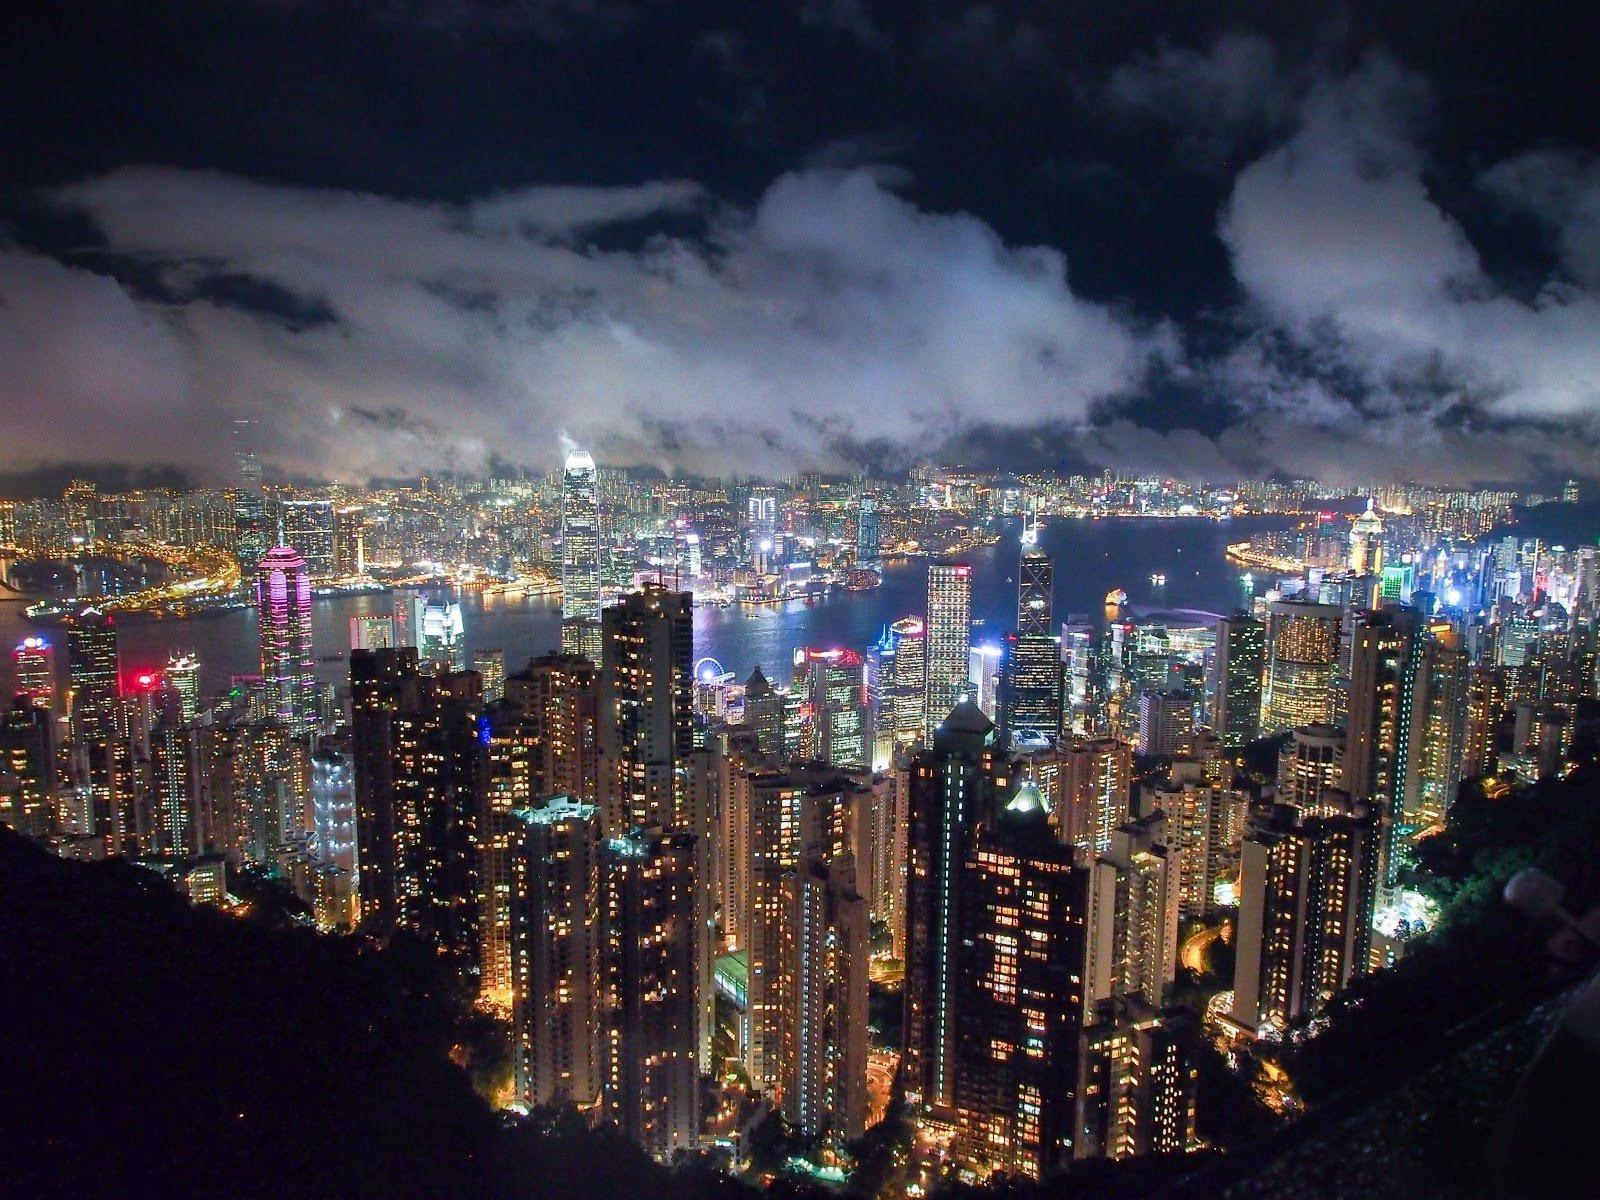 cityscape-photography-yun-xu